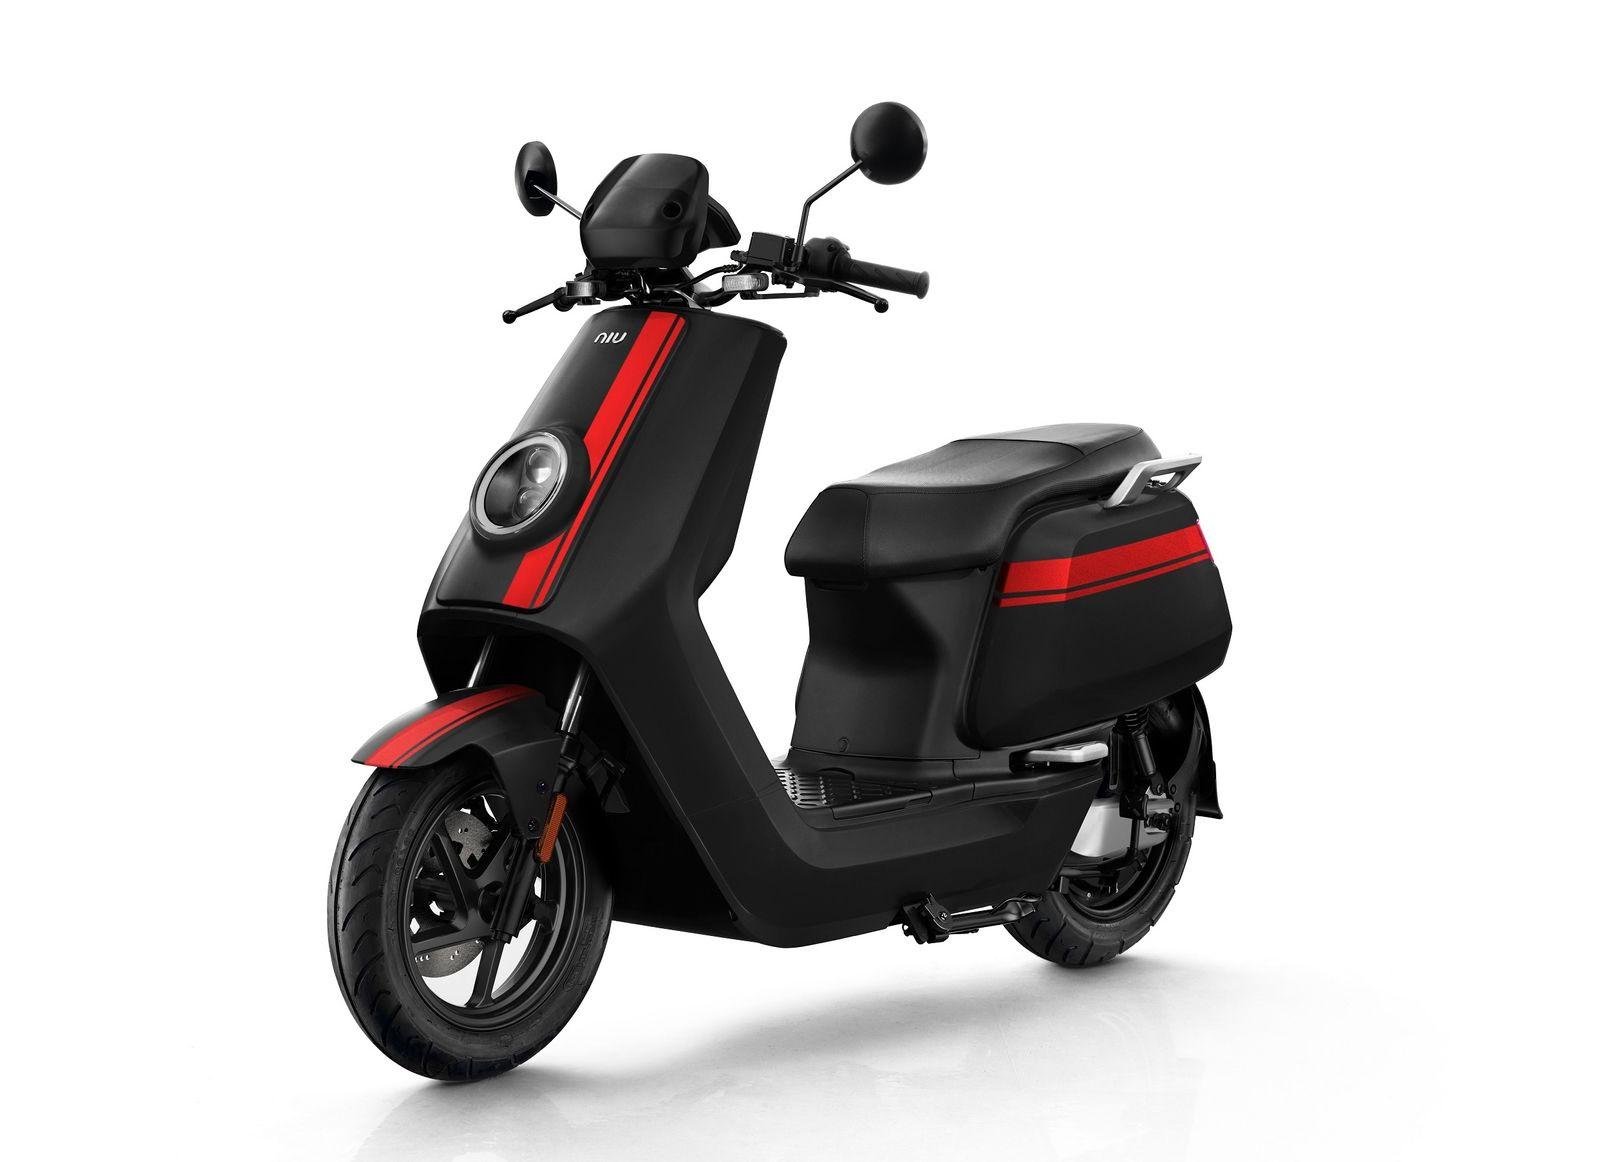 Niu NQI PRO E-scooter